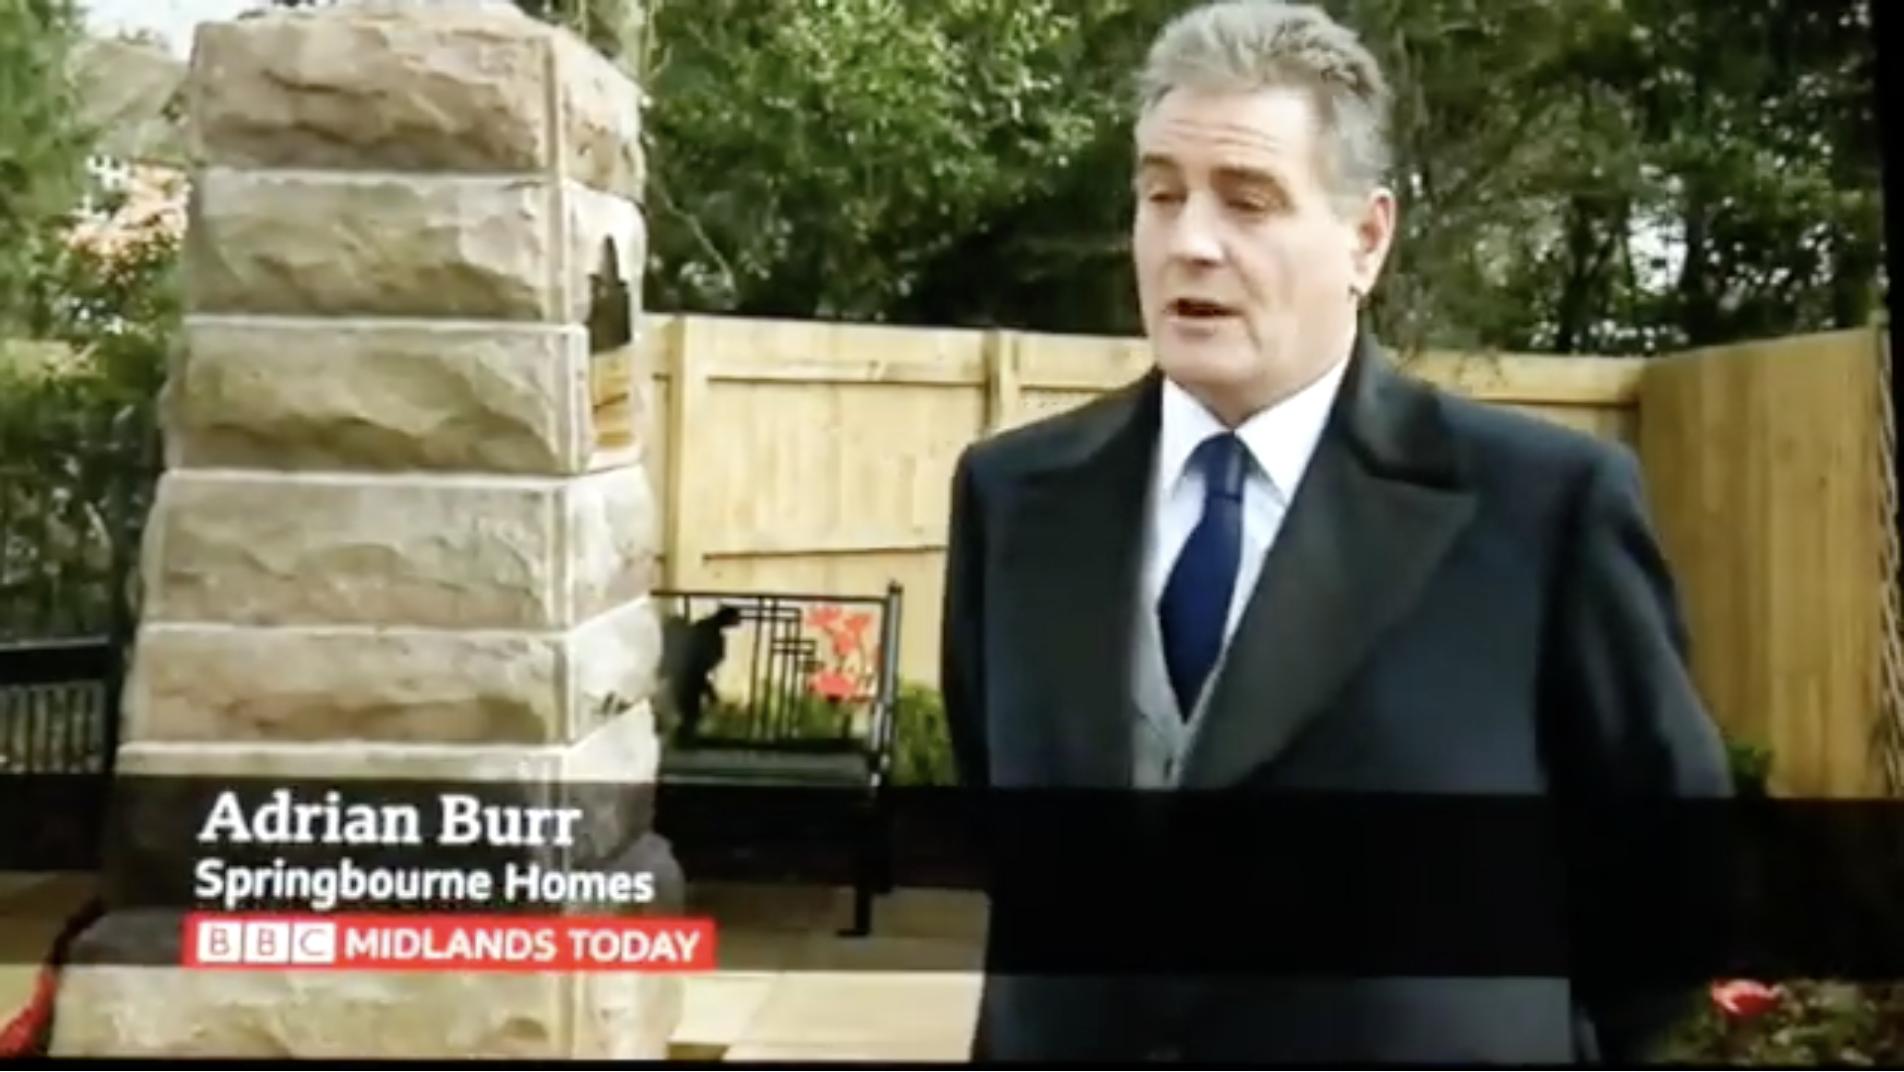 BBC screen grab